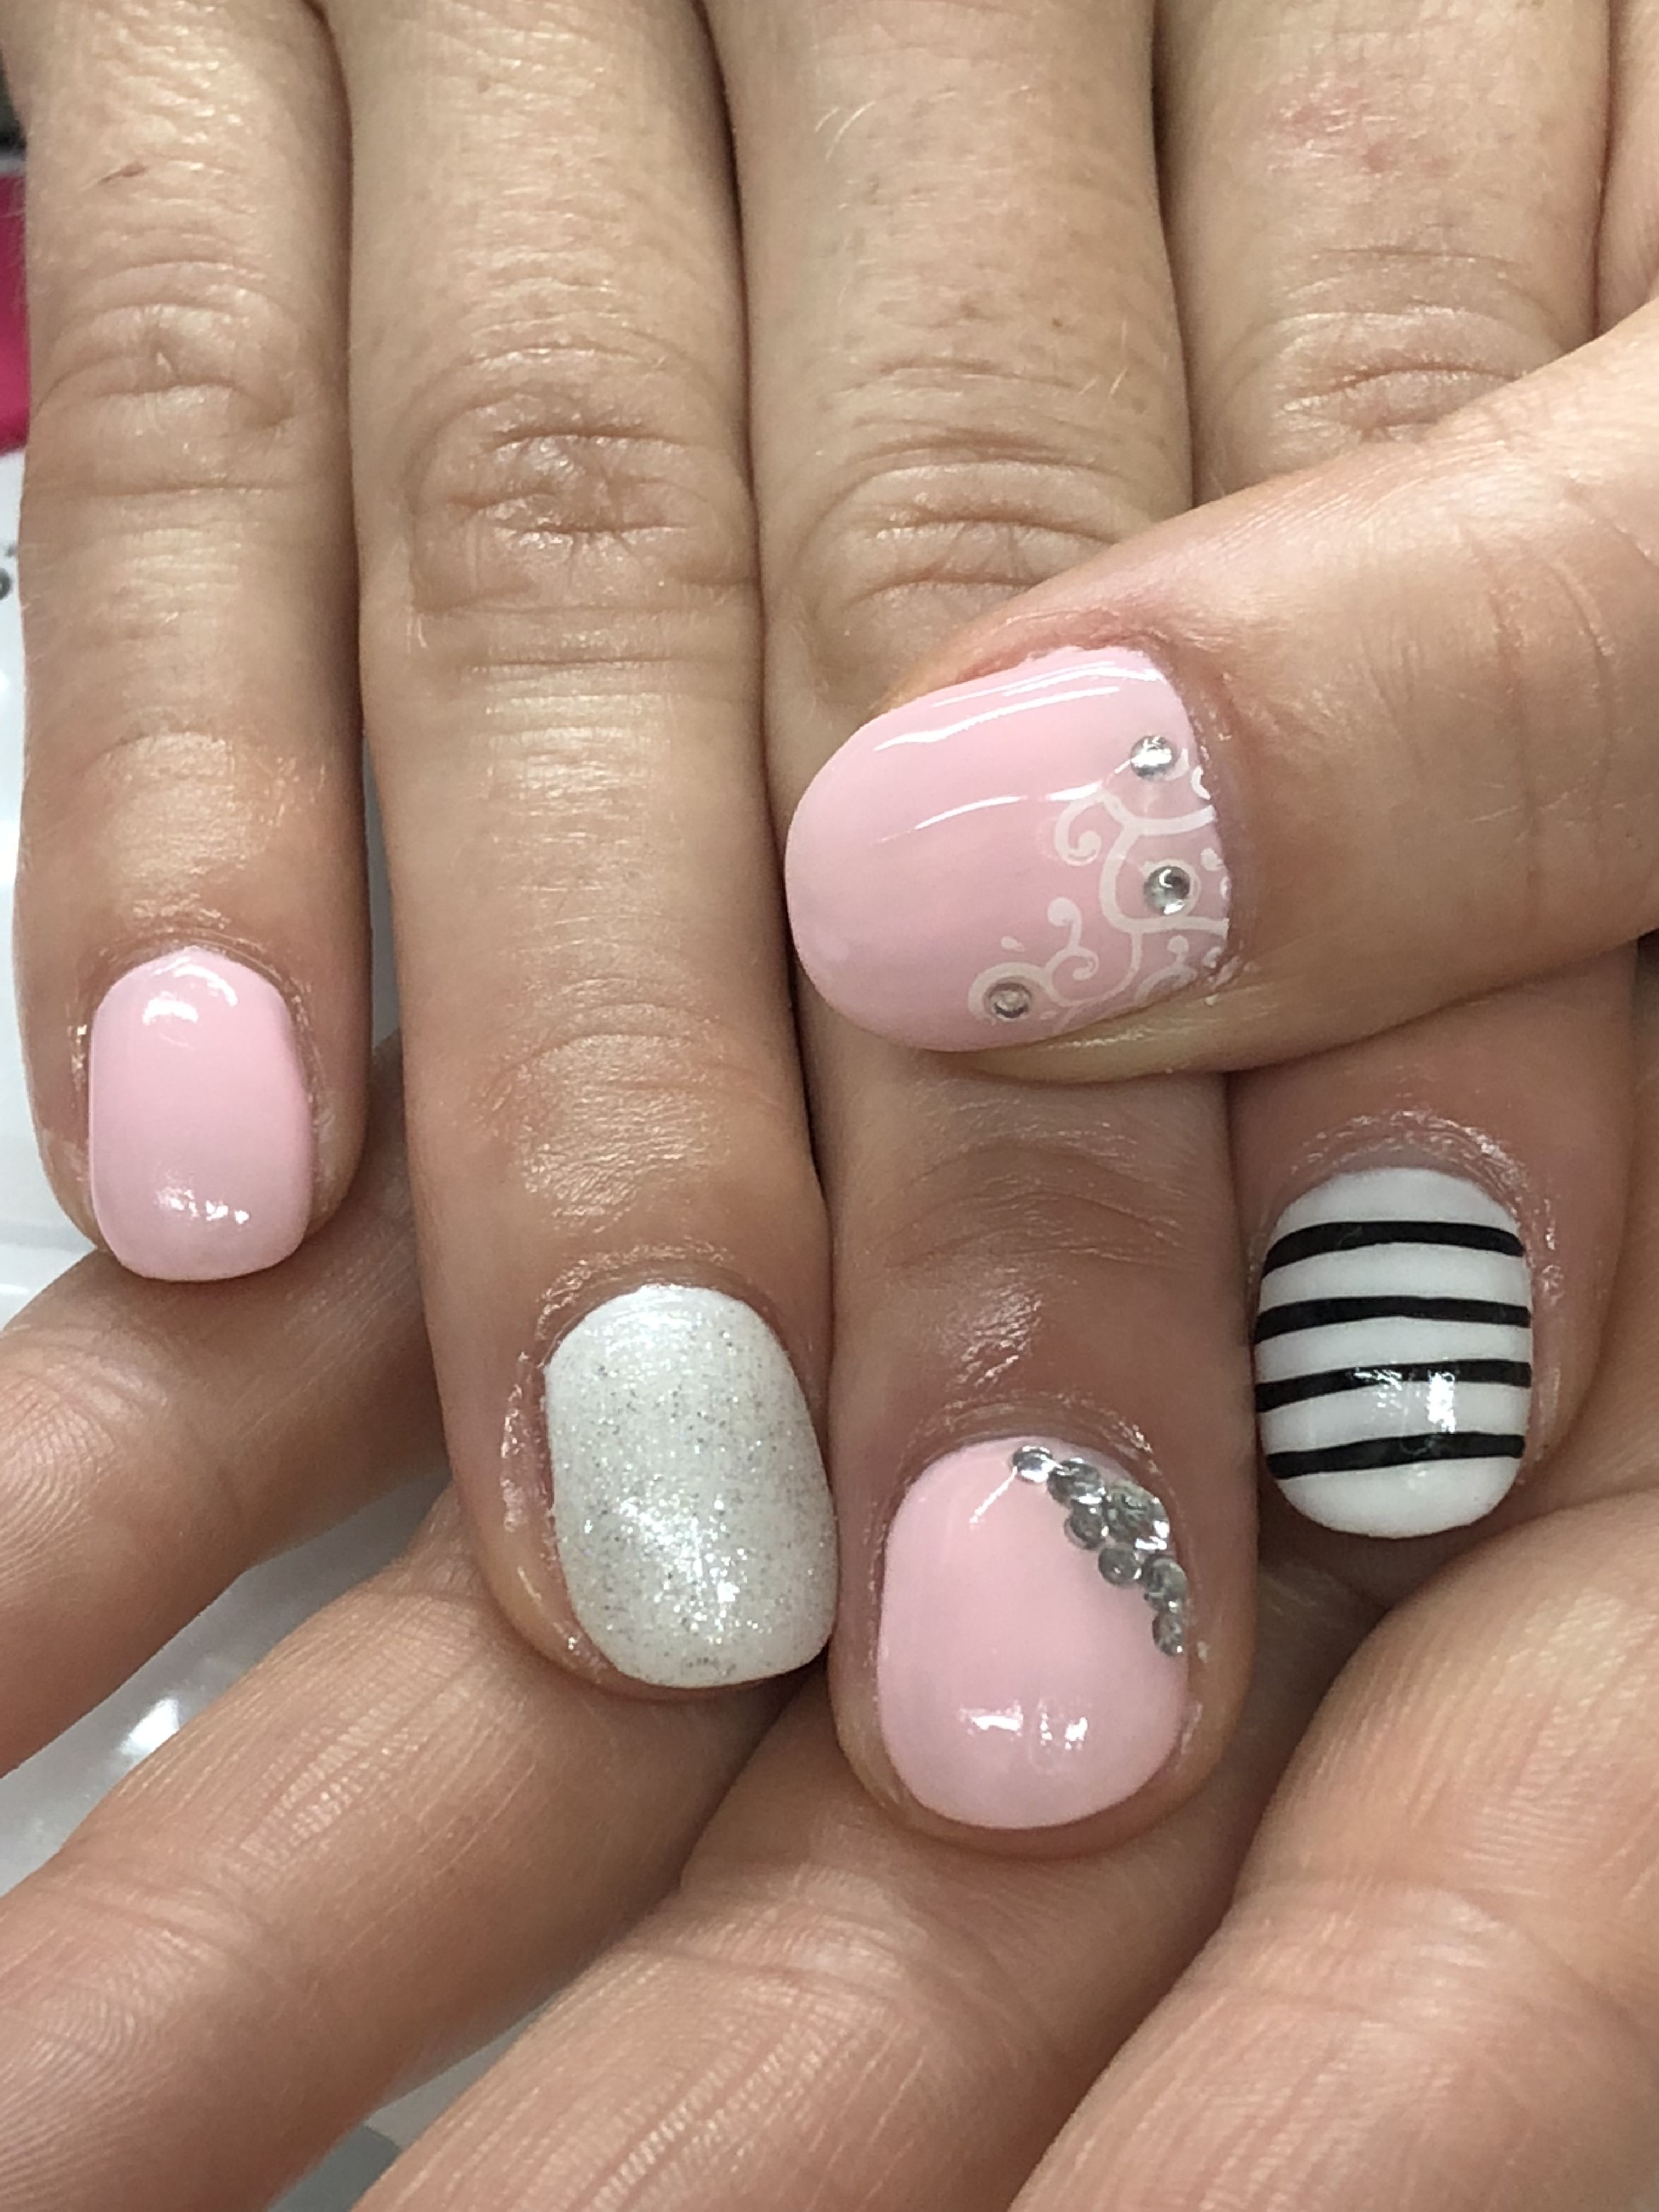 Spring Summer Elegant Simple Pink White Rhinestones Gel Nails Gel Nails Gel Nail Designs White Rhinestone